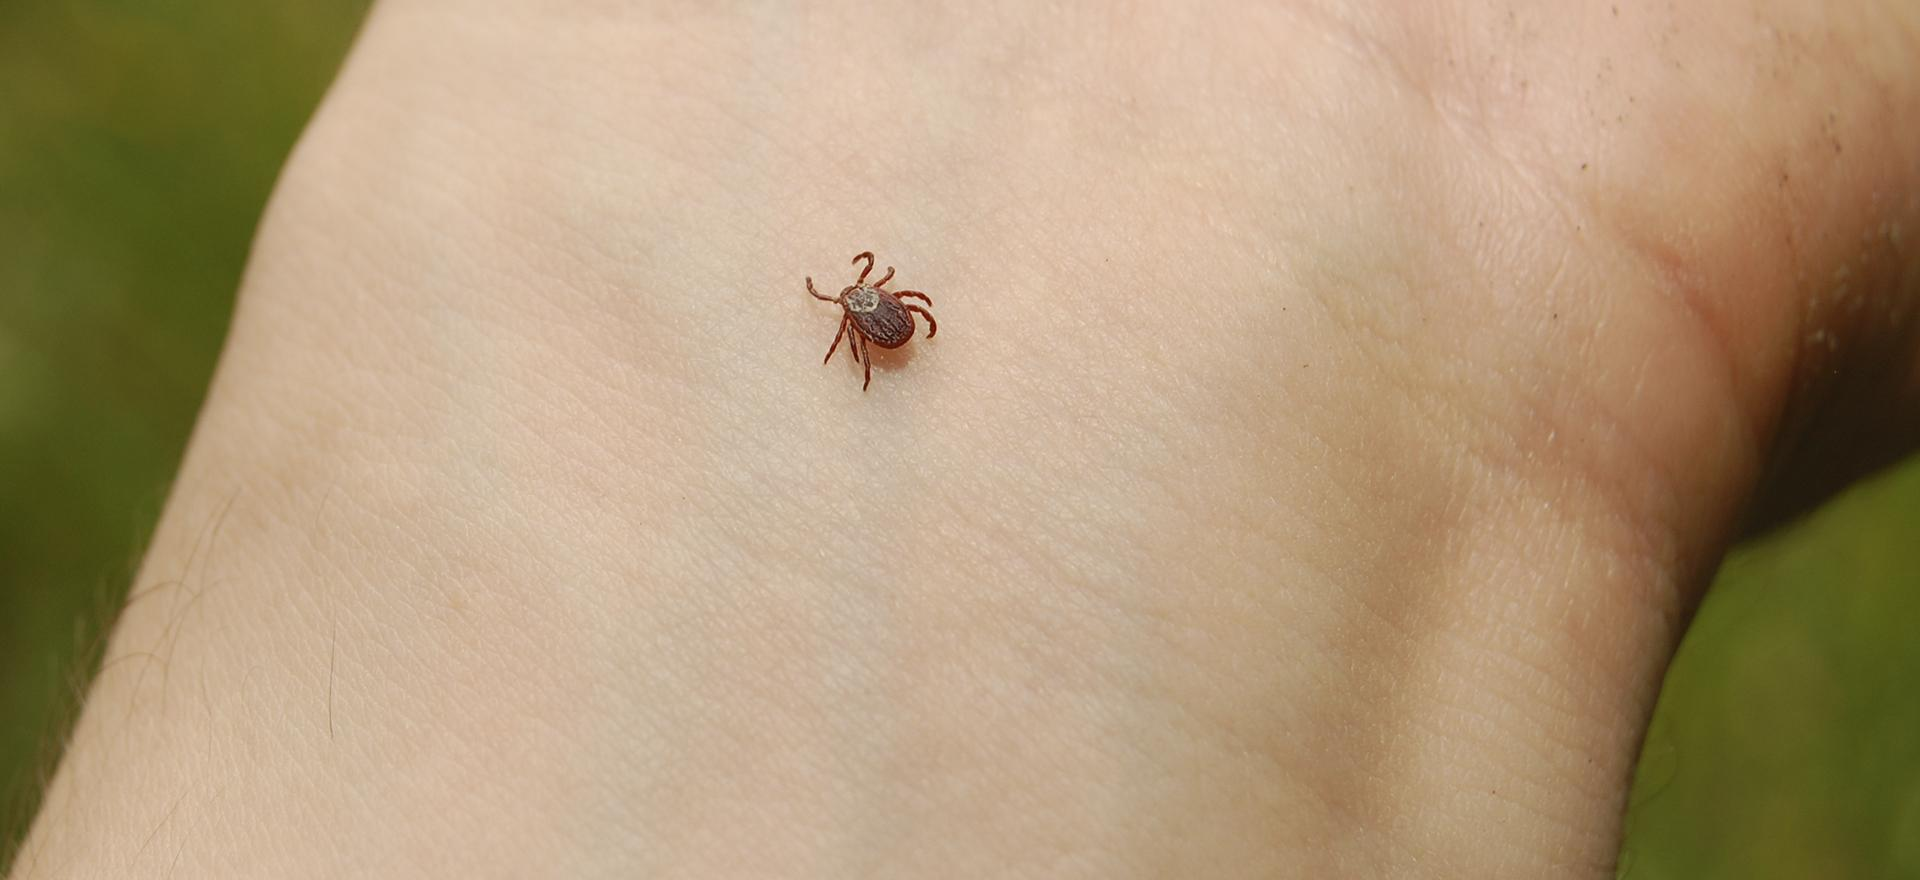 close up of a tick